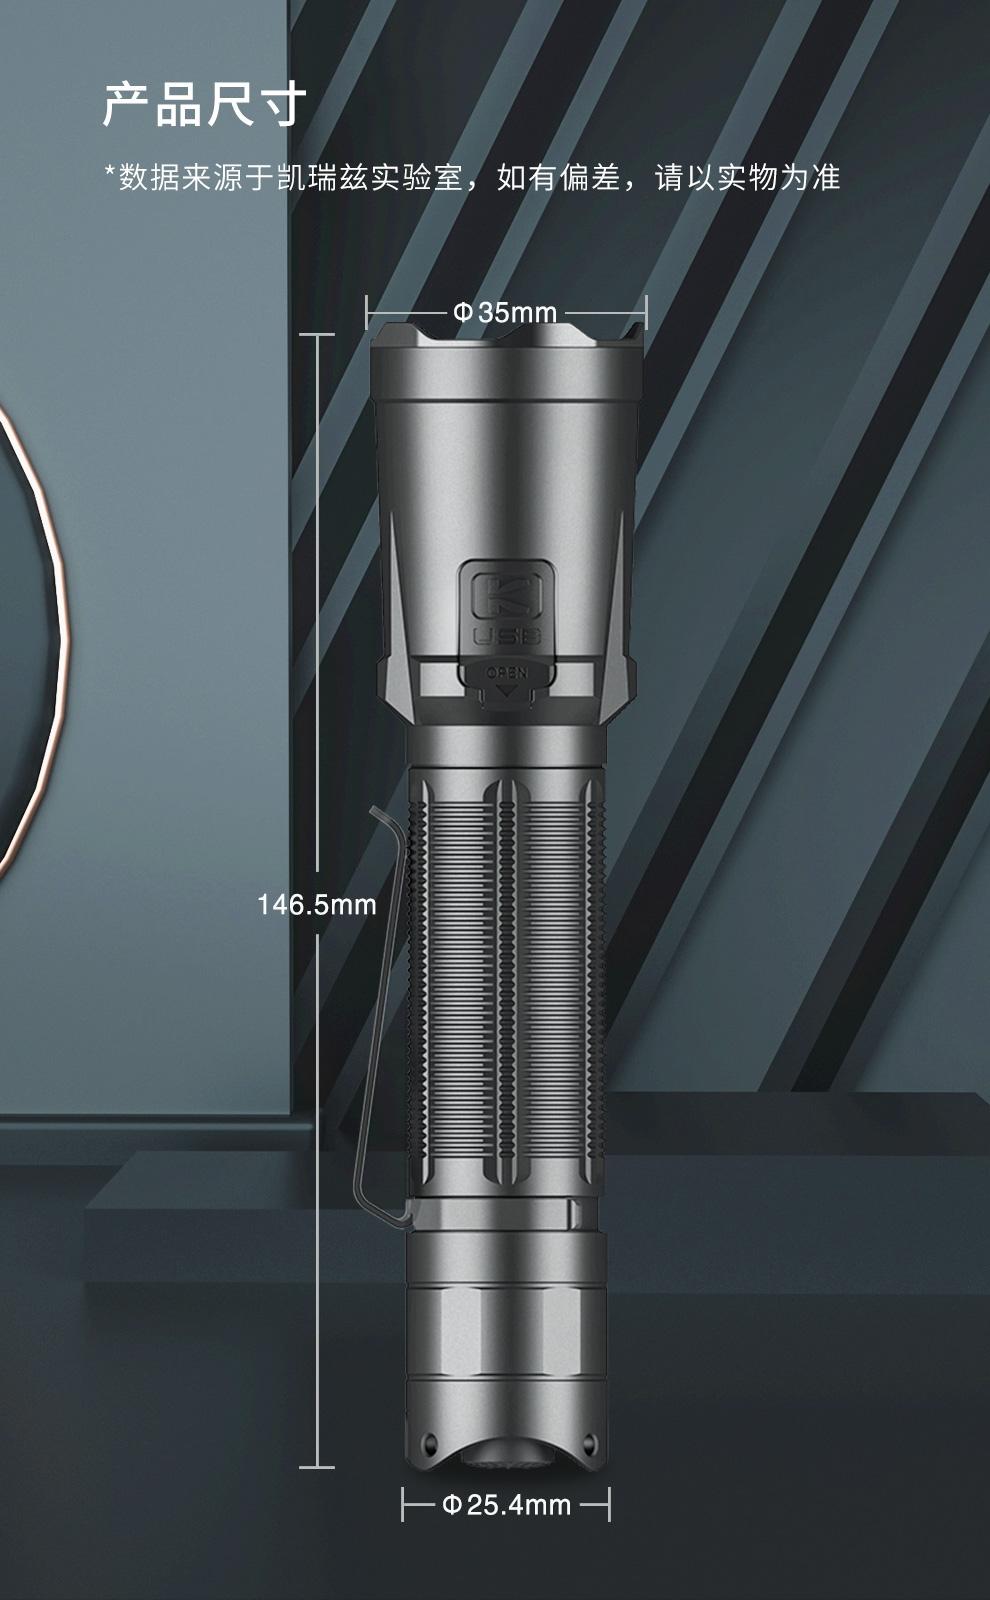 KLARUS XT21C 戰術手電筒 3200流明 -14